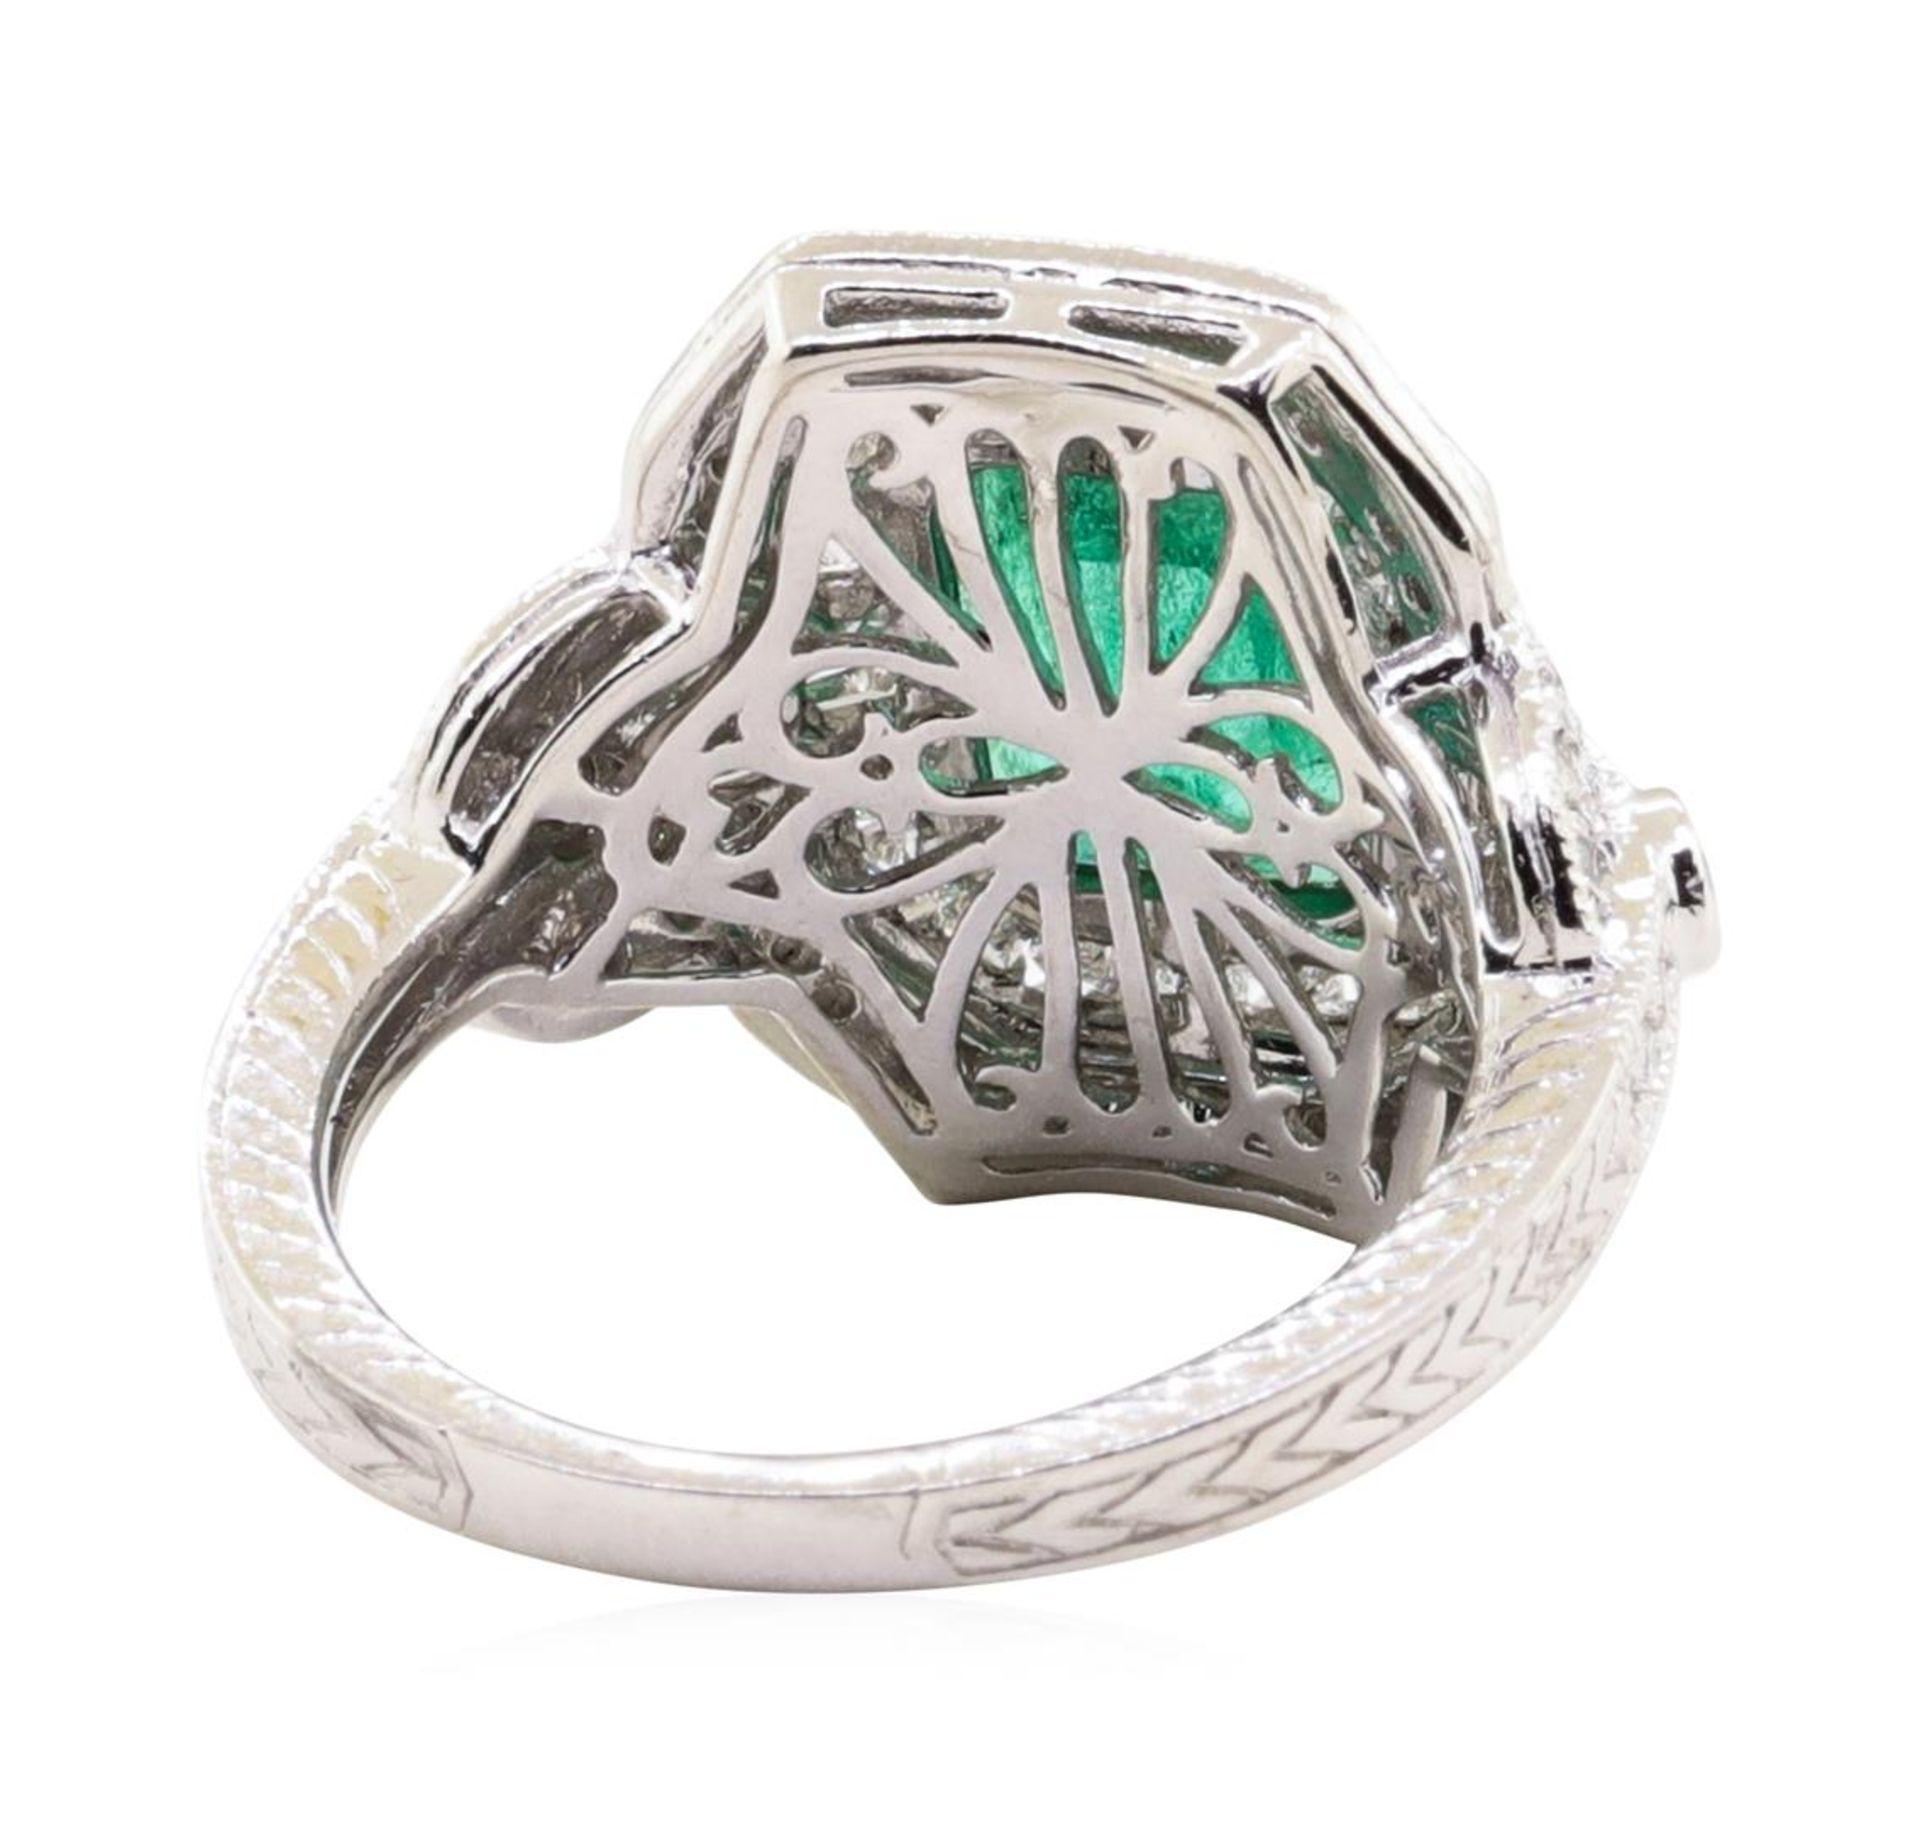 1.94ct Emerald and Diamond Ring - Platinum - Image 4 of 5